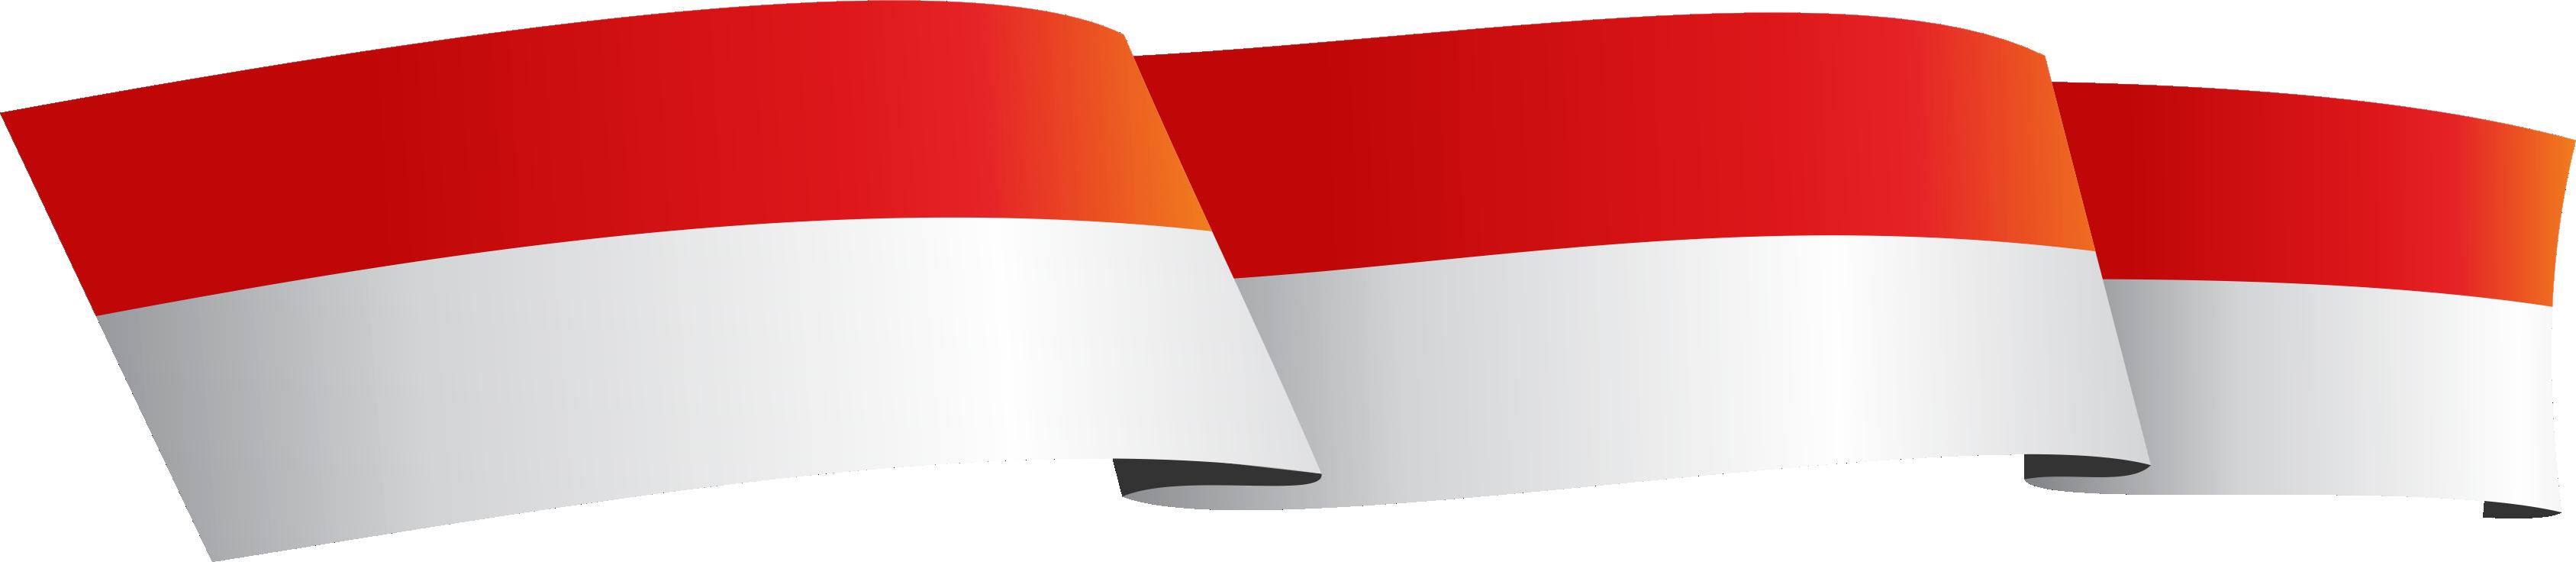 Bendera Merah Putih PNG, Background Bendera Indonesia   Free ...